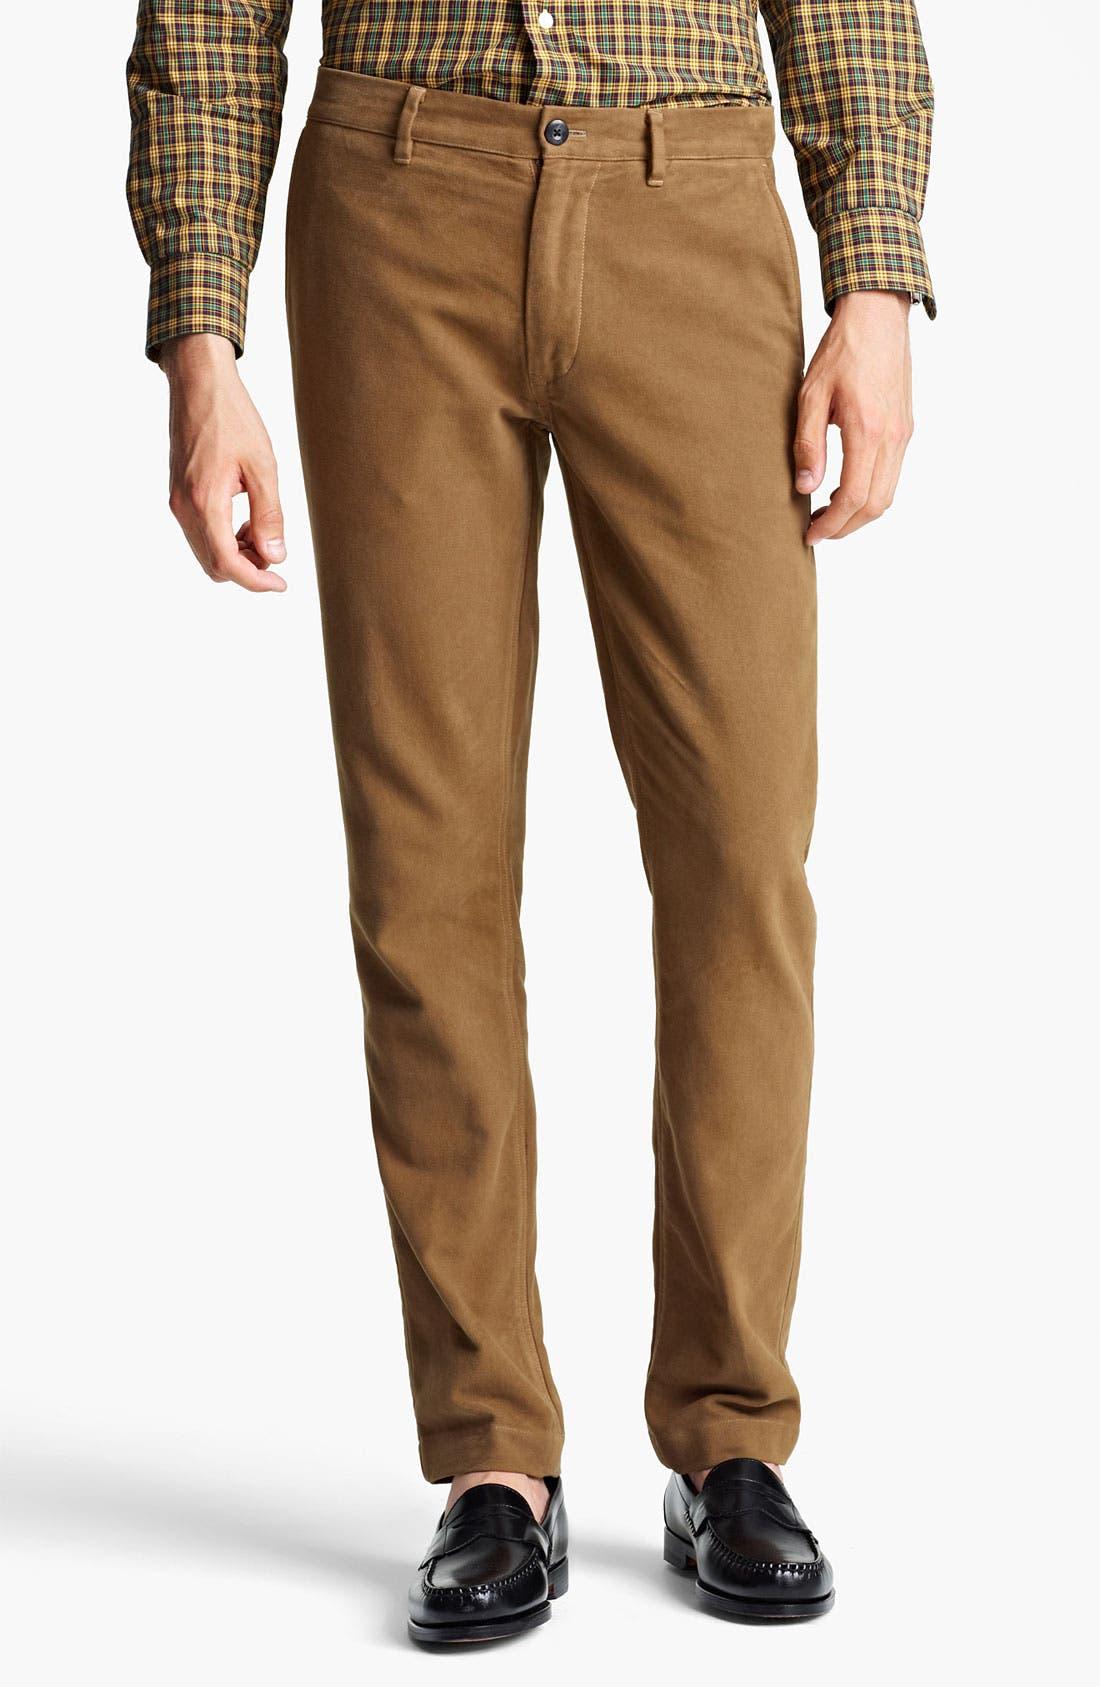 Alternate Image 1 Selected - Jack Spade 'Dwight' Moleskin Cotton Trousers